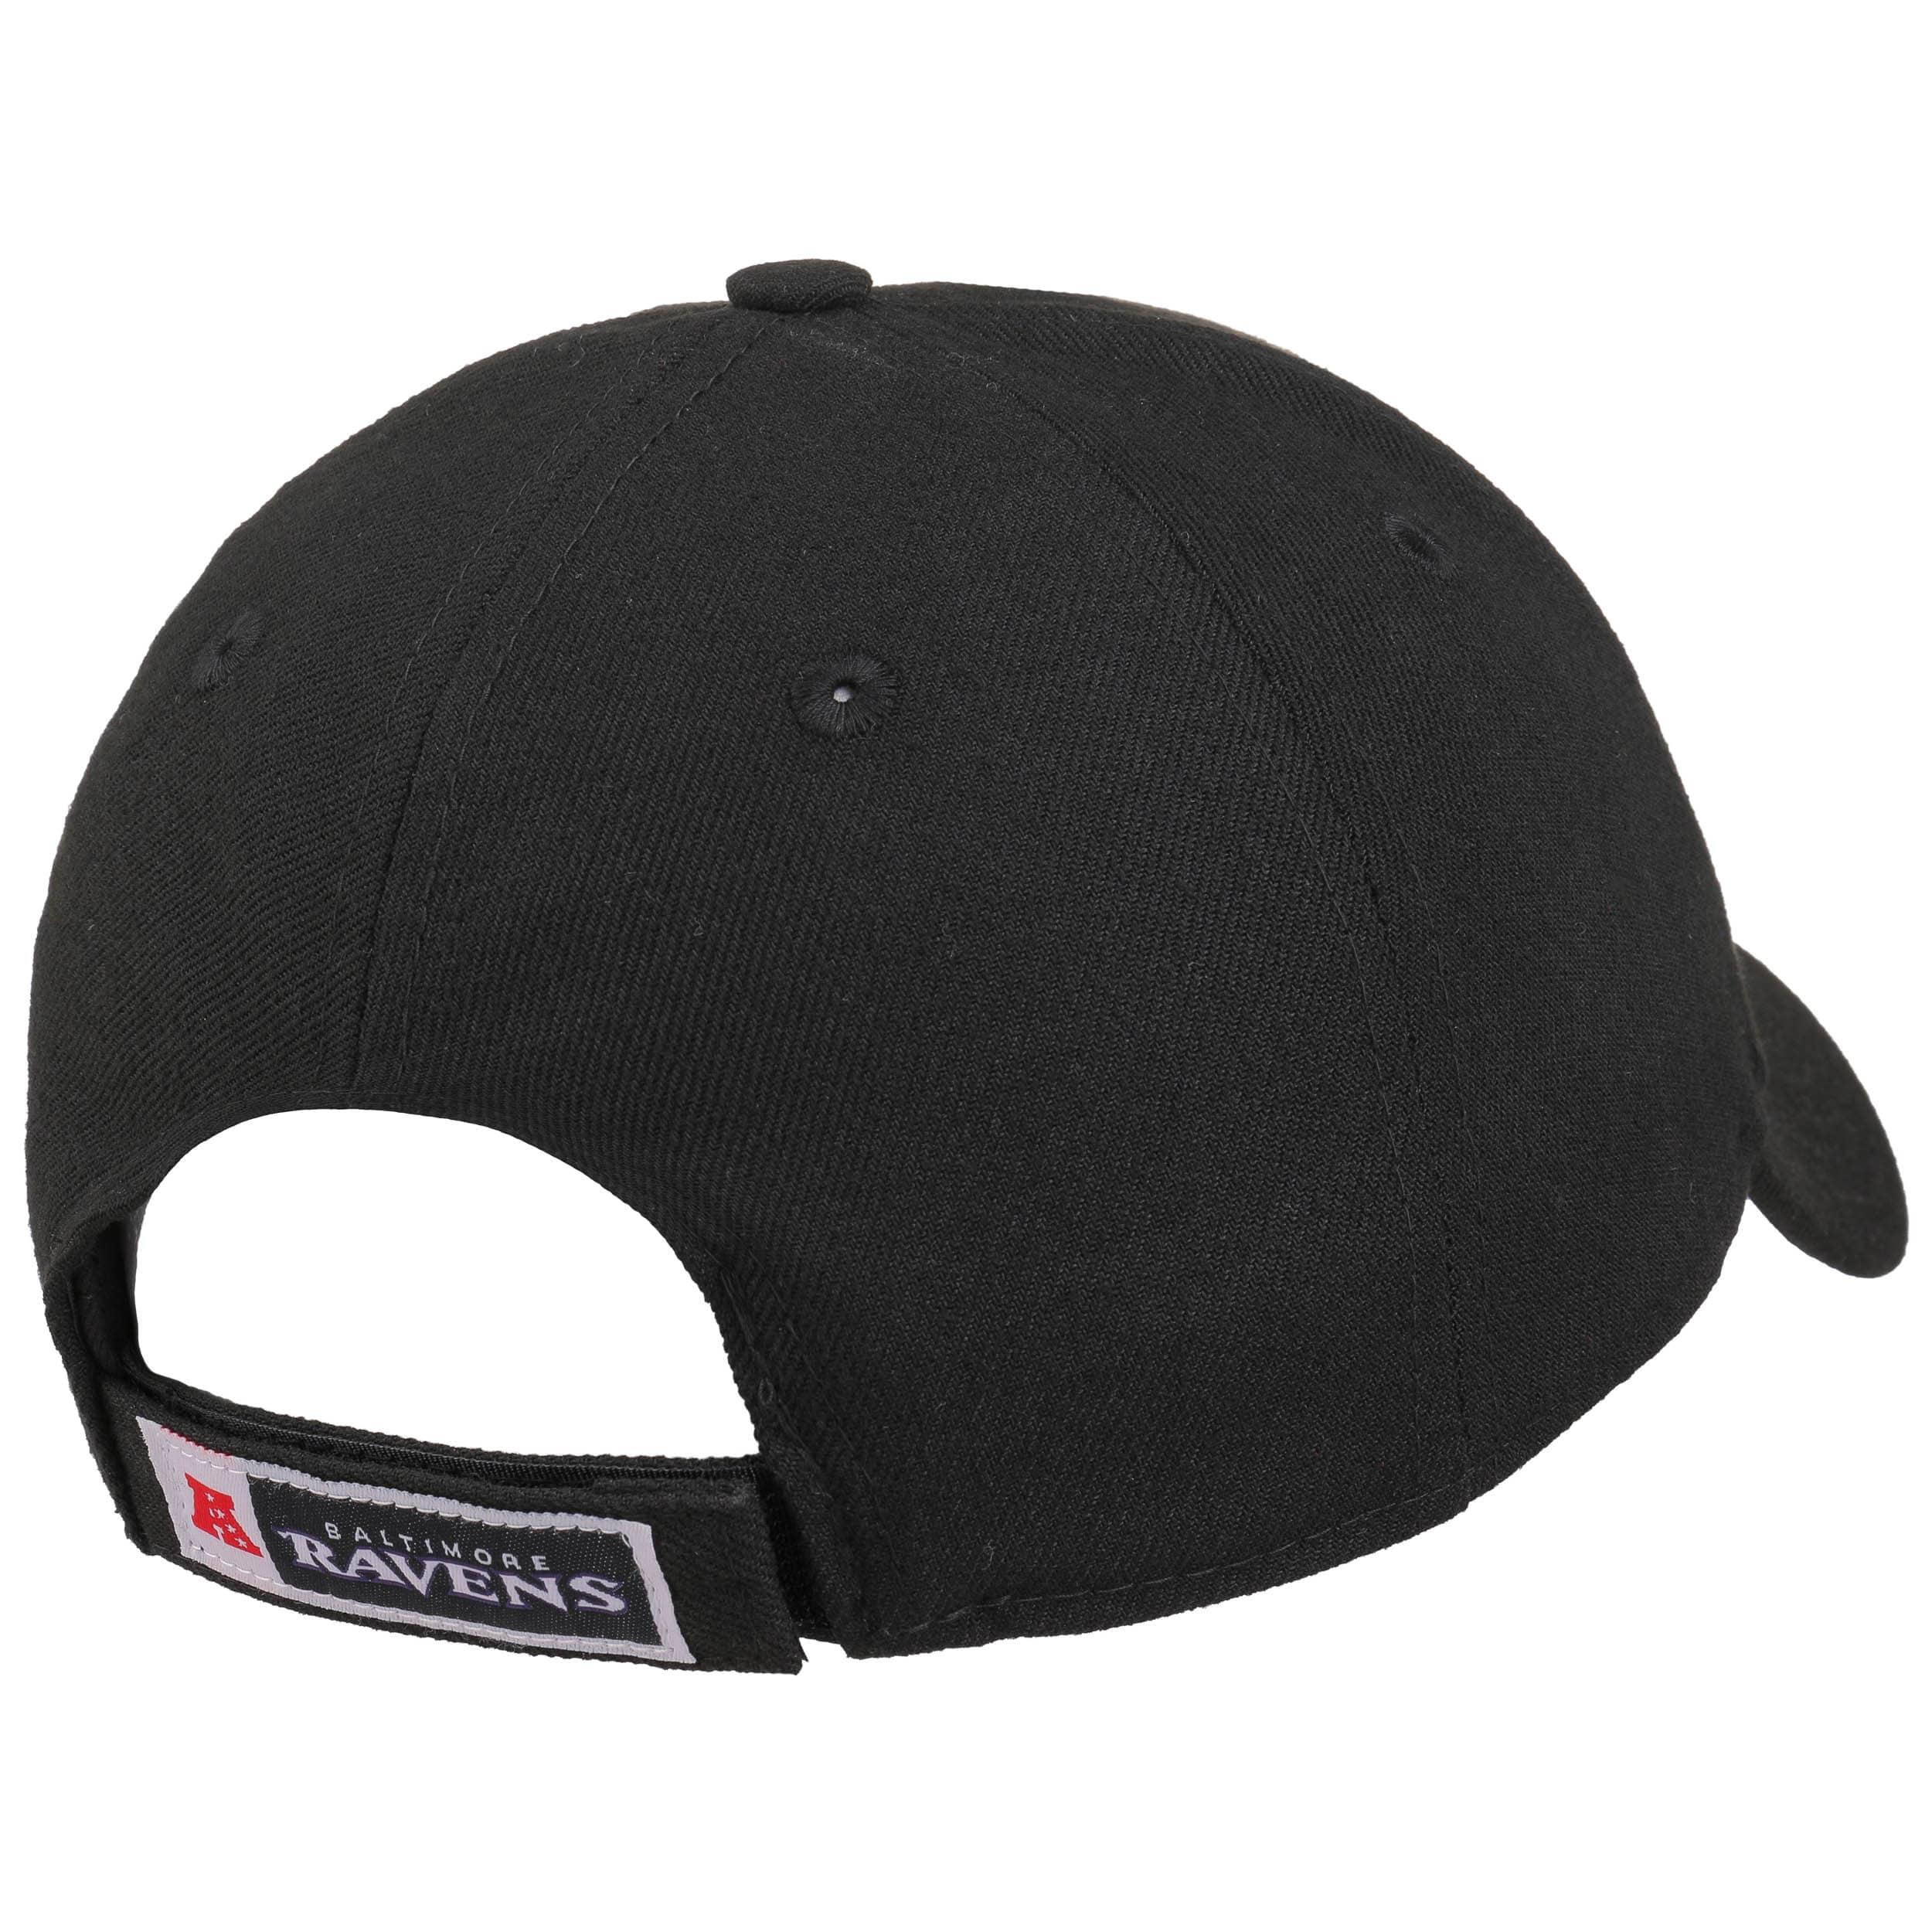 5ffae97b70e9a ... 9Forty The League Ravens Cap by New Era - black 3 ...